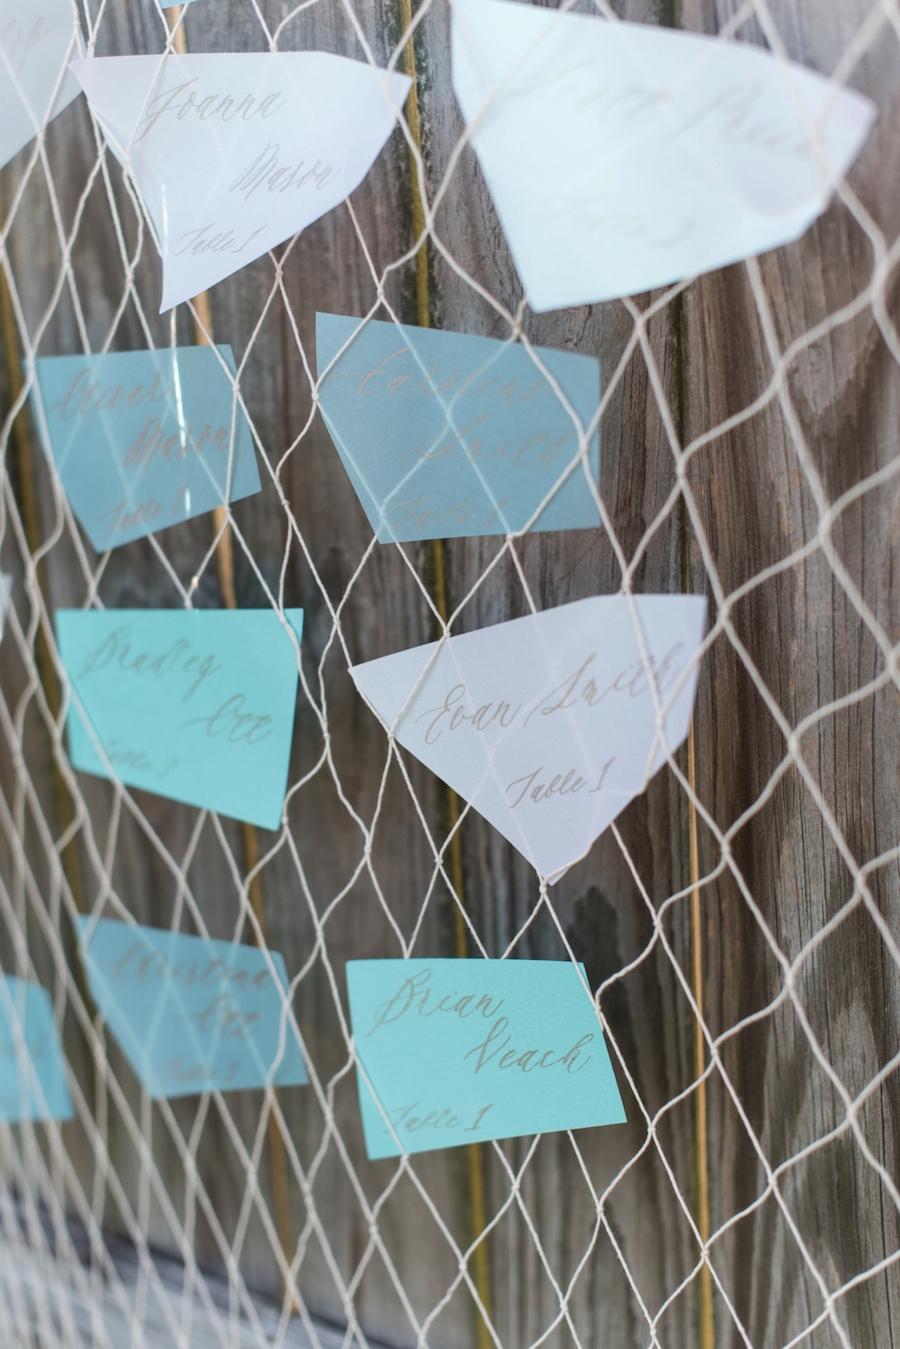 Coastal, Sea-Glass Inspired Beach Wedding Seating Chart with Fishing Net| Wedding Seating Chart Alternatives | Tampa Bay Wedding Photographer, Caroline & Evan Photography